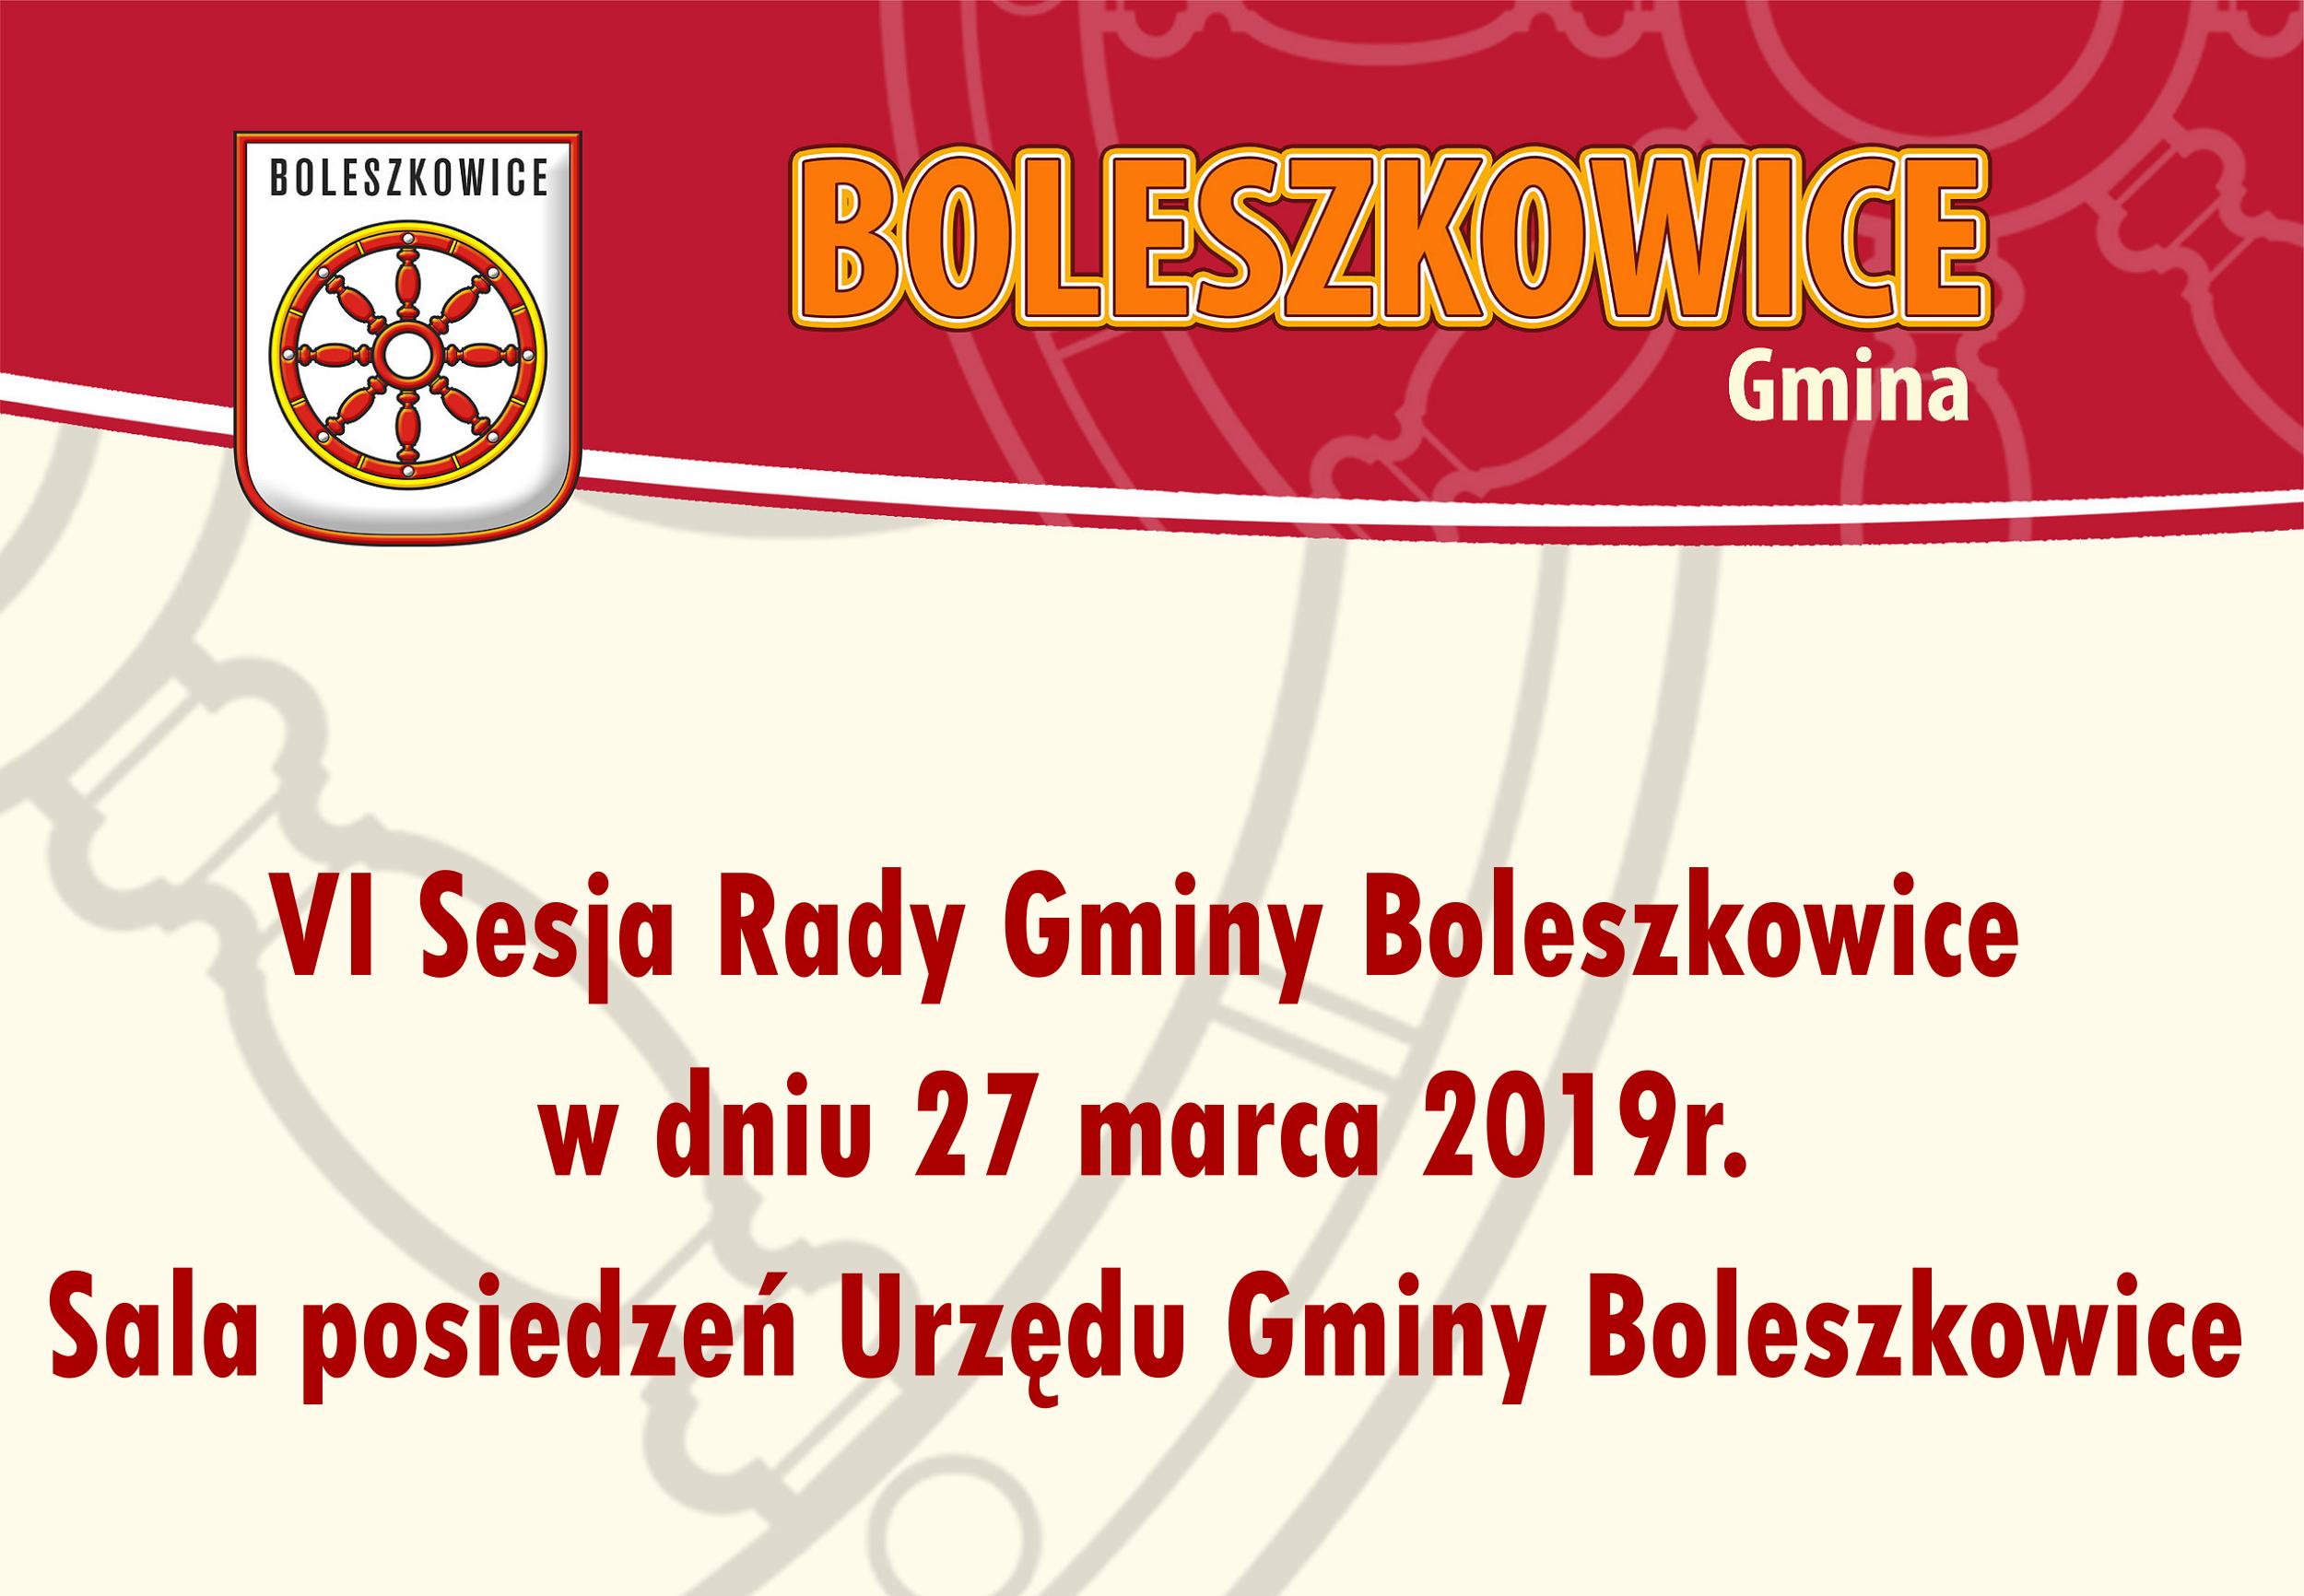 boleszkowice/text821.png